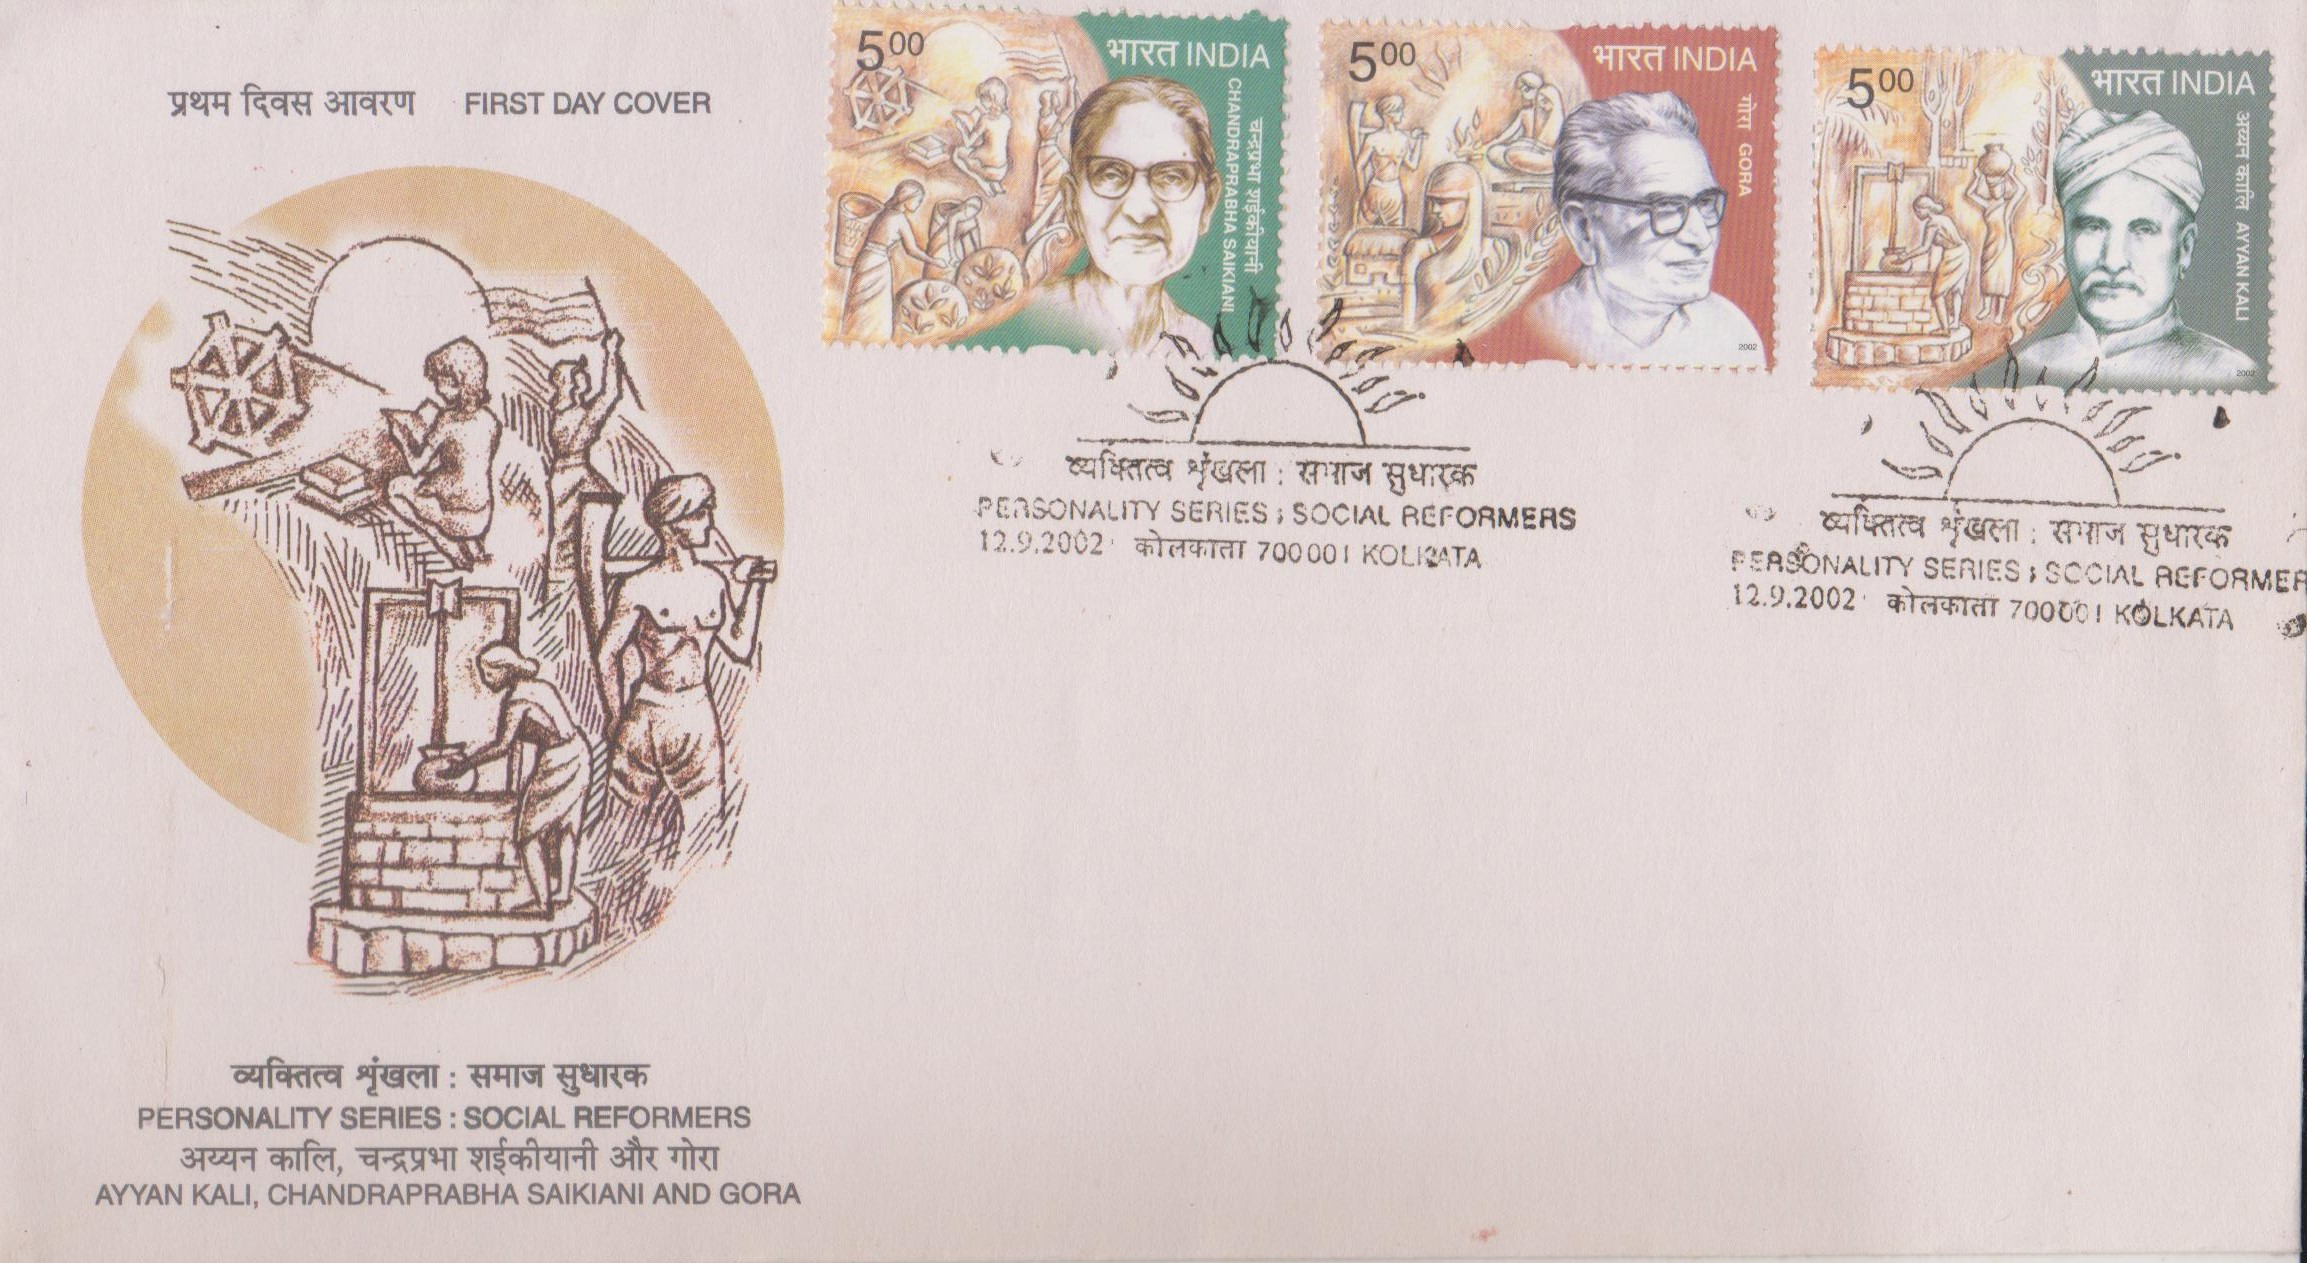 Ayyankali, Chandraprava Saikiani, Goparaju Ramachandra Rao